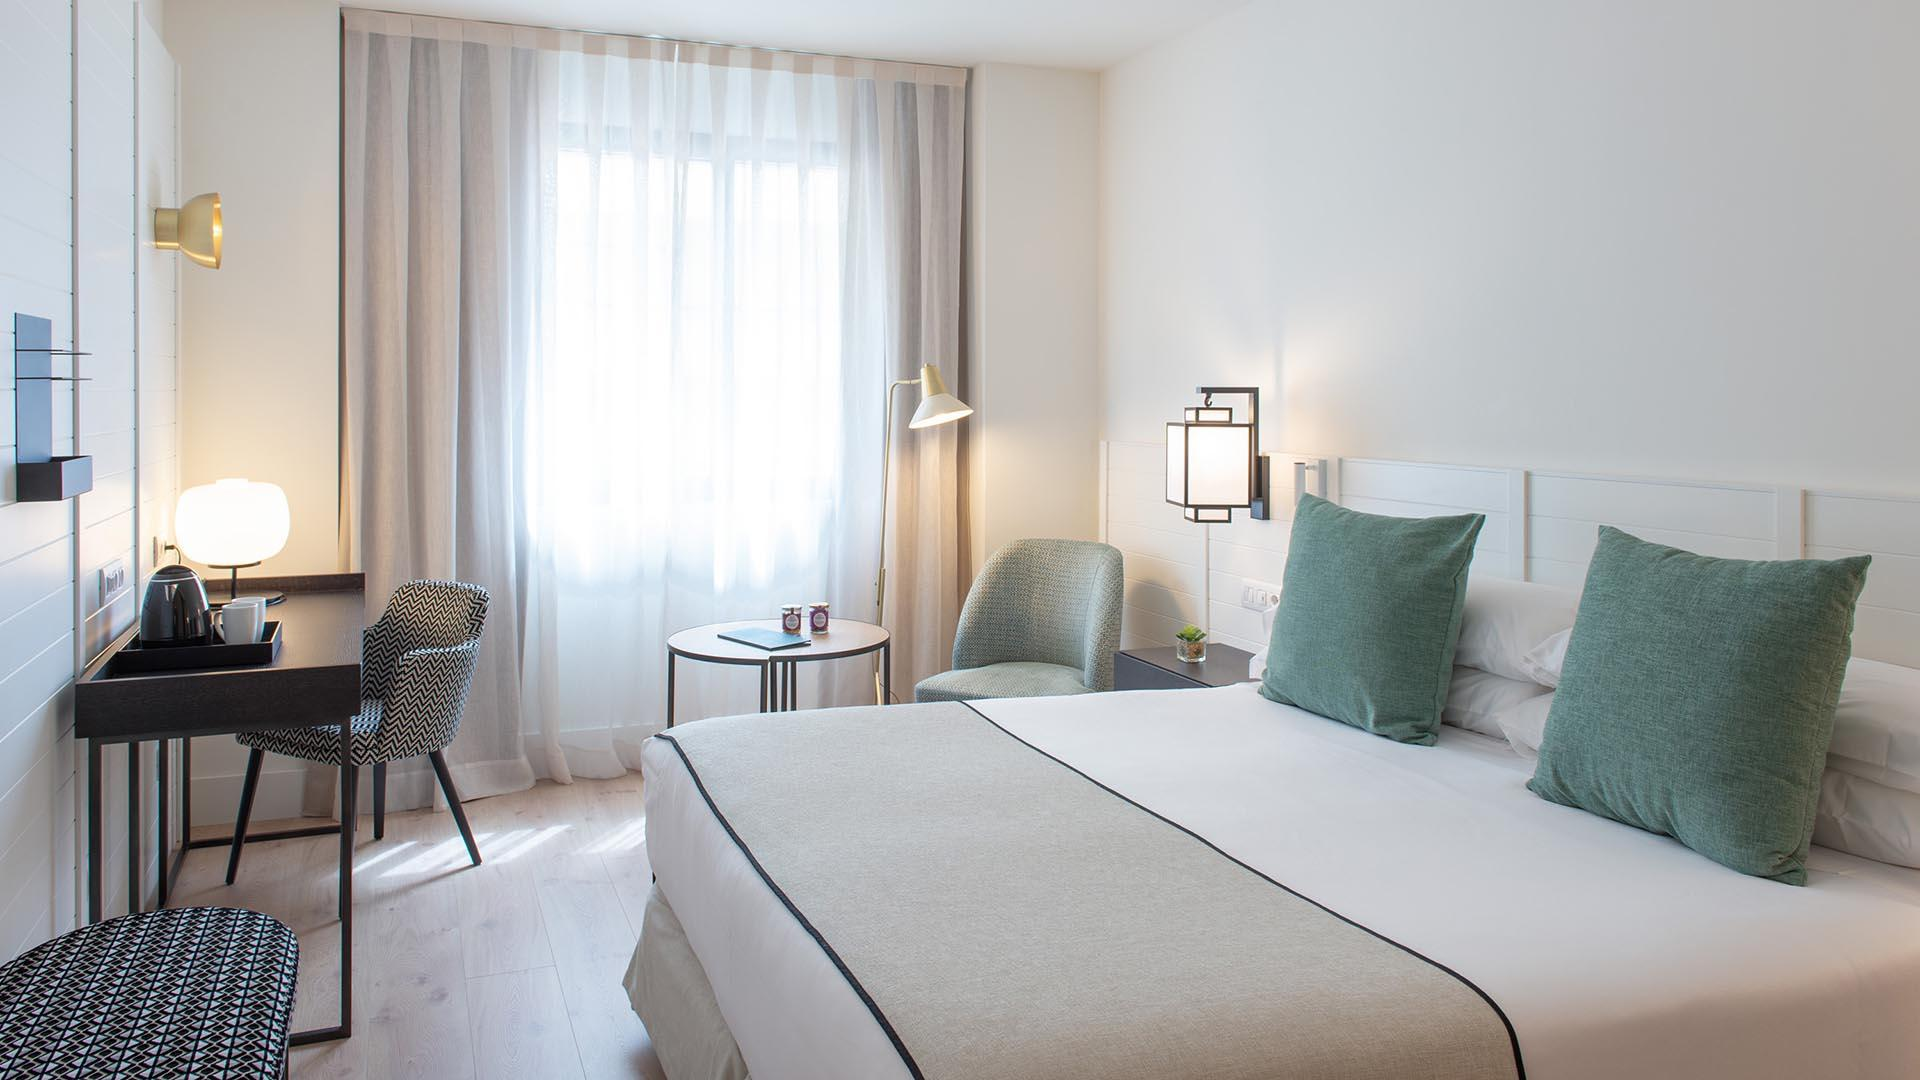 Double Standard Room at Hotel Molina Lario